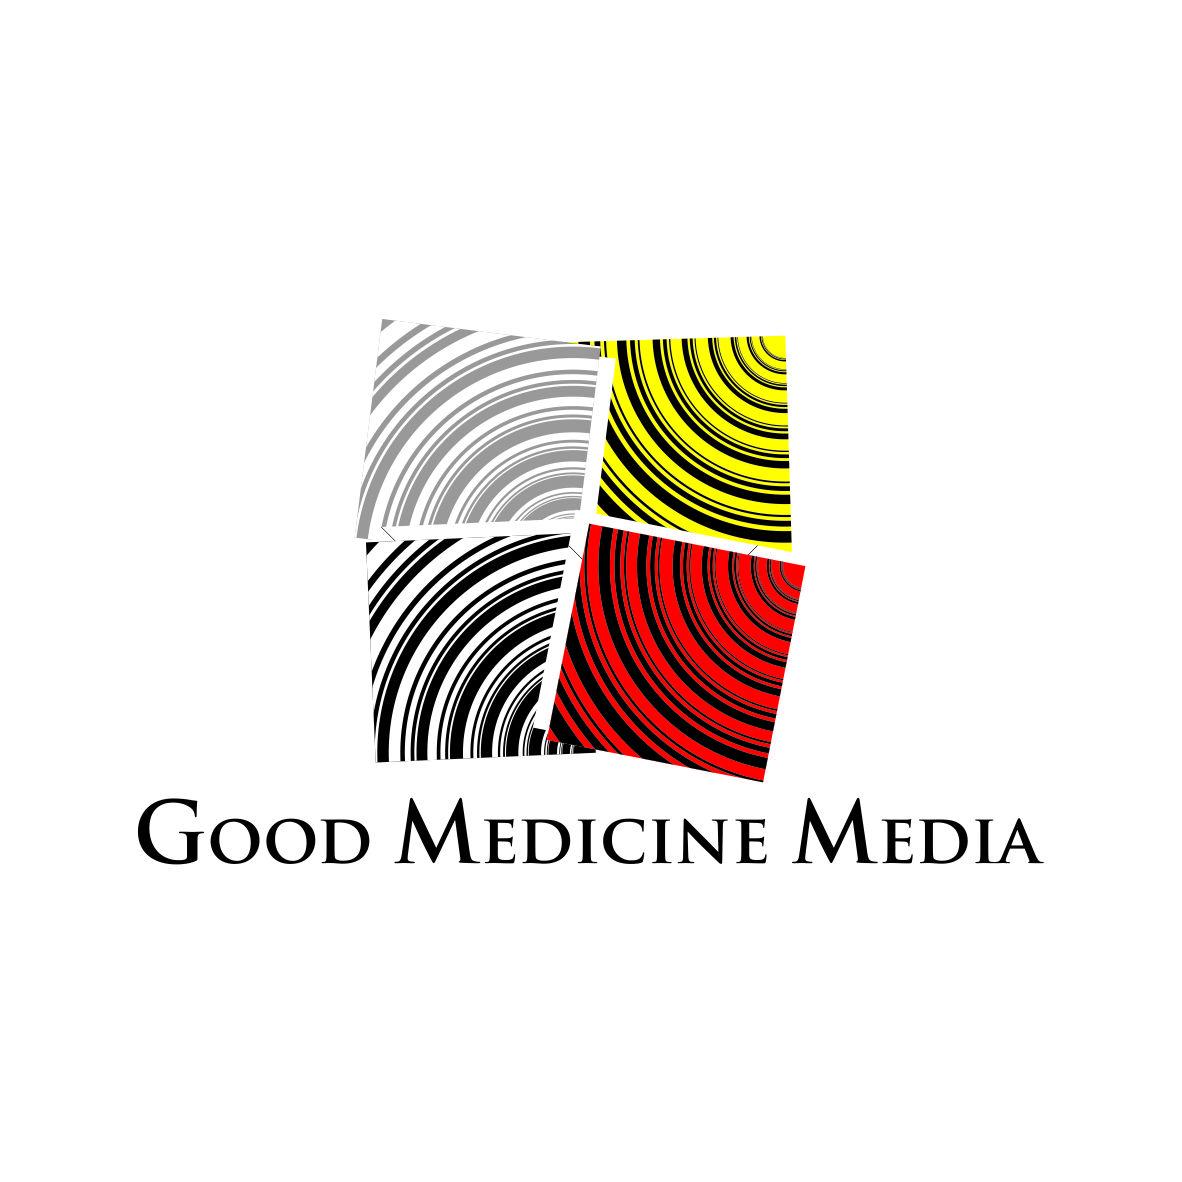 Logo Design by arteo_design - Entry No. 64 in the Logo Design Contest Good Medicine Media Logo Design.